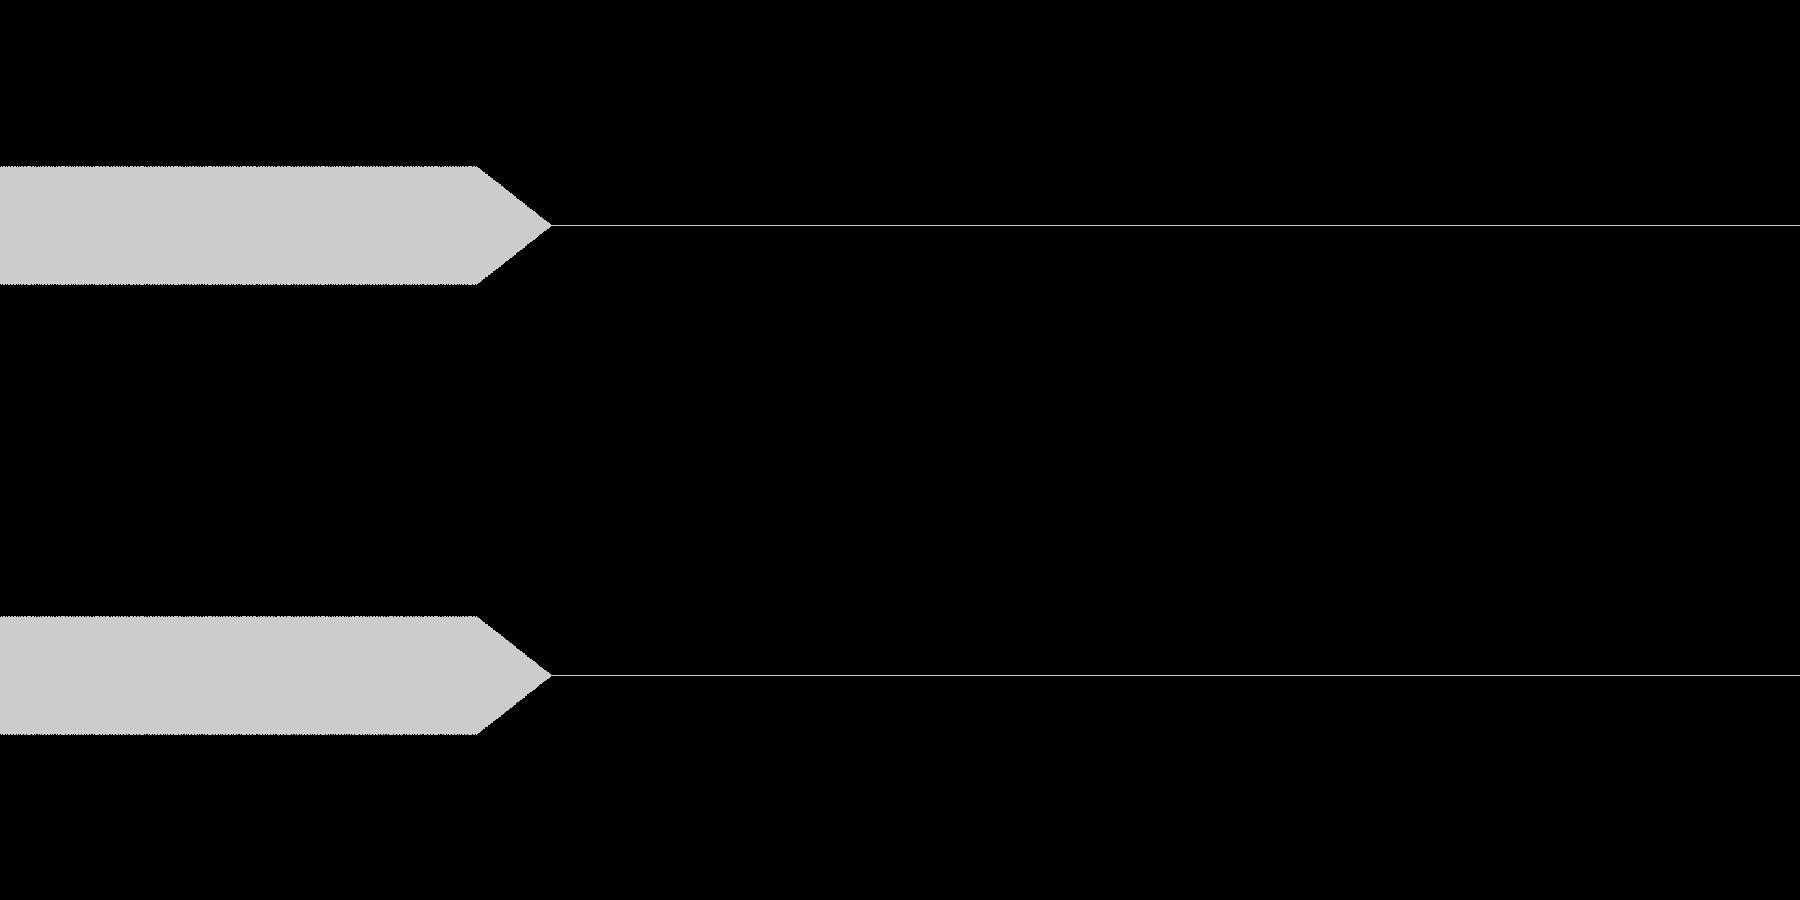 3kHz_100msec(ピッ)の未再生の波形